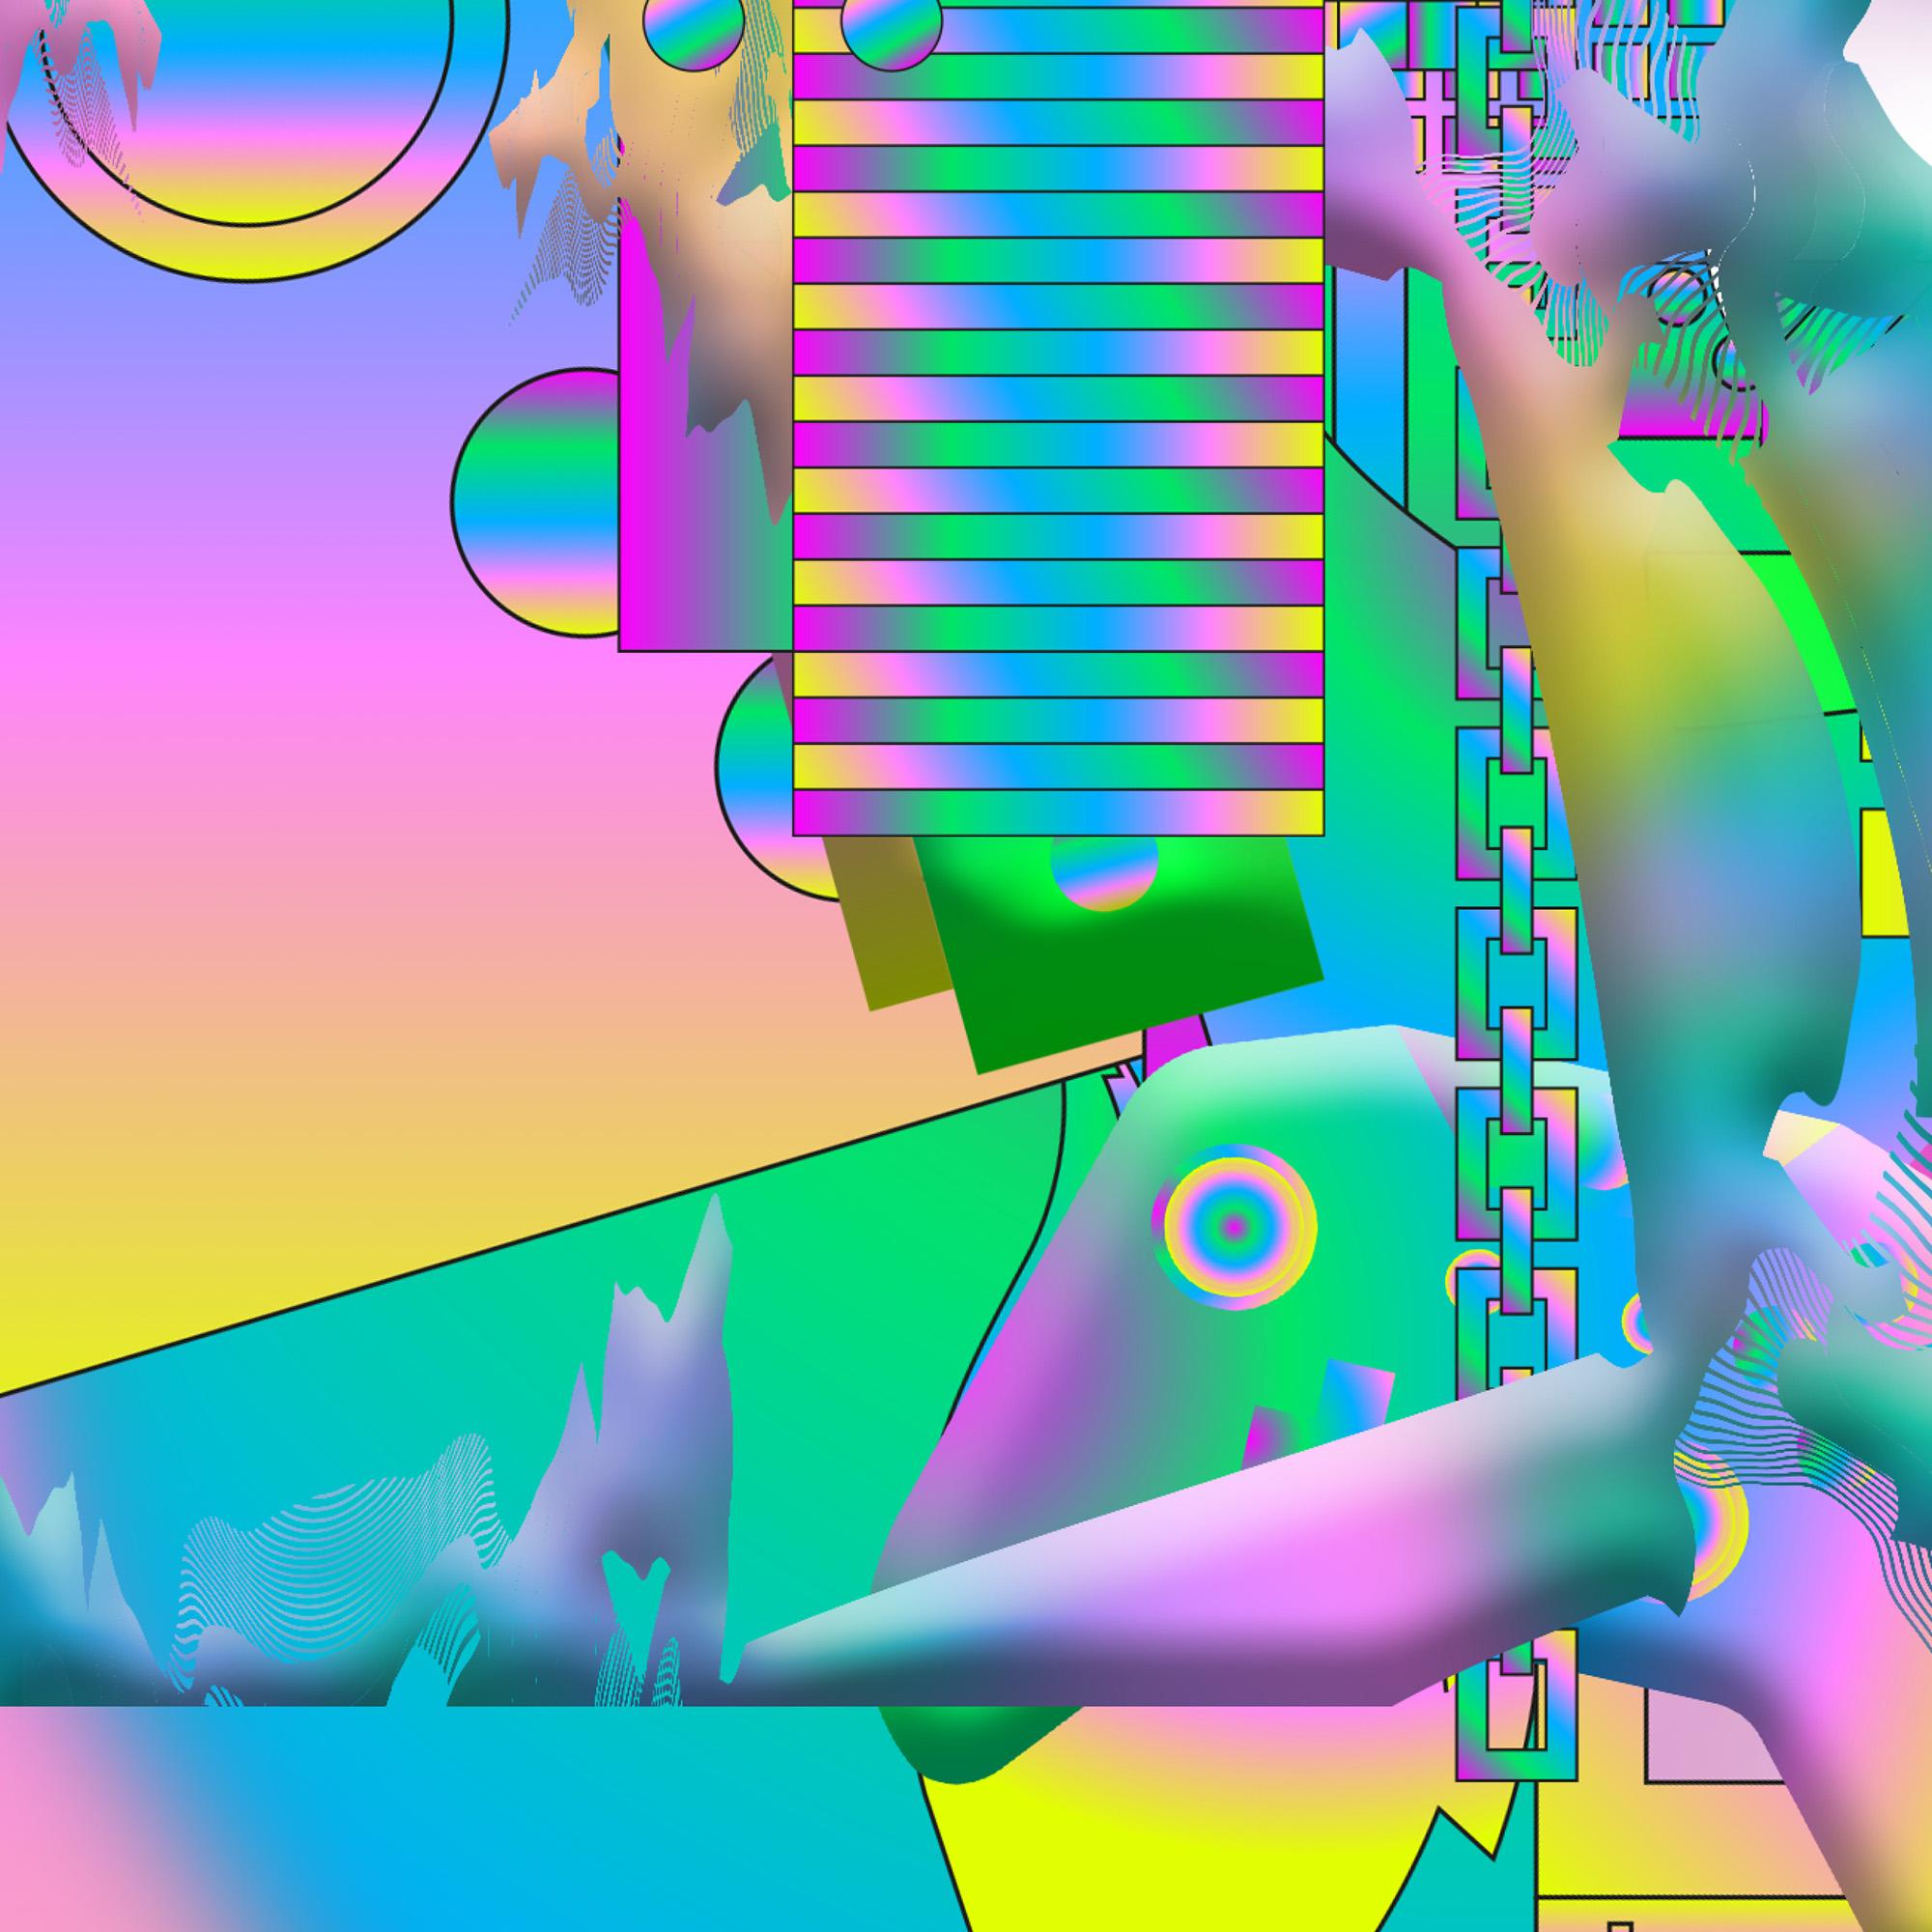 square6.jpg